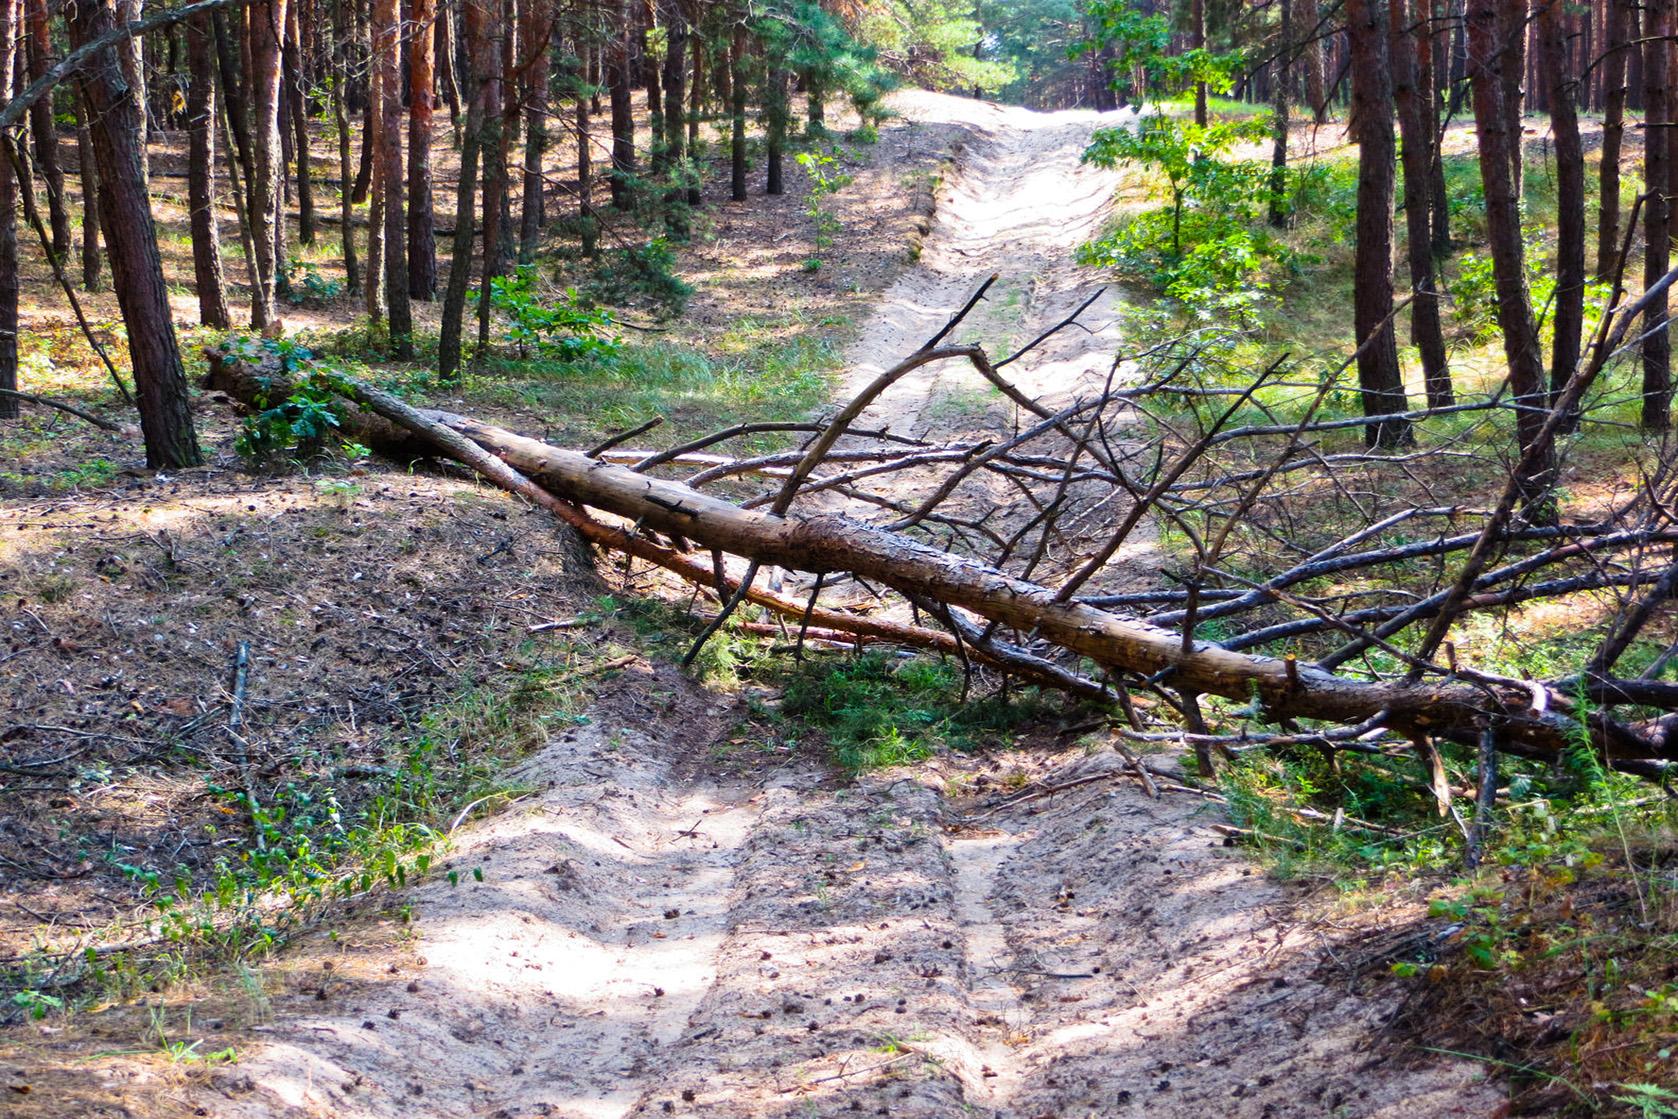 63218004 - the pine tree has fallen across the road